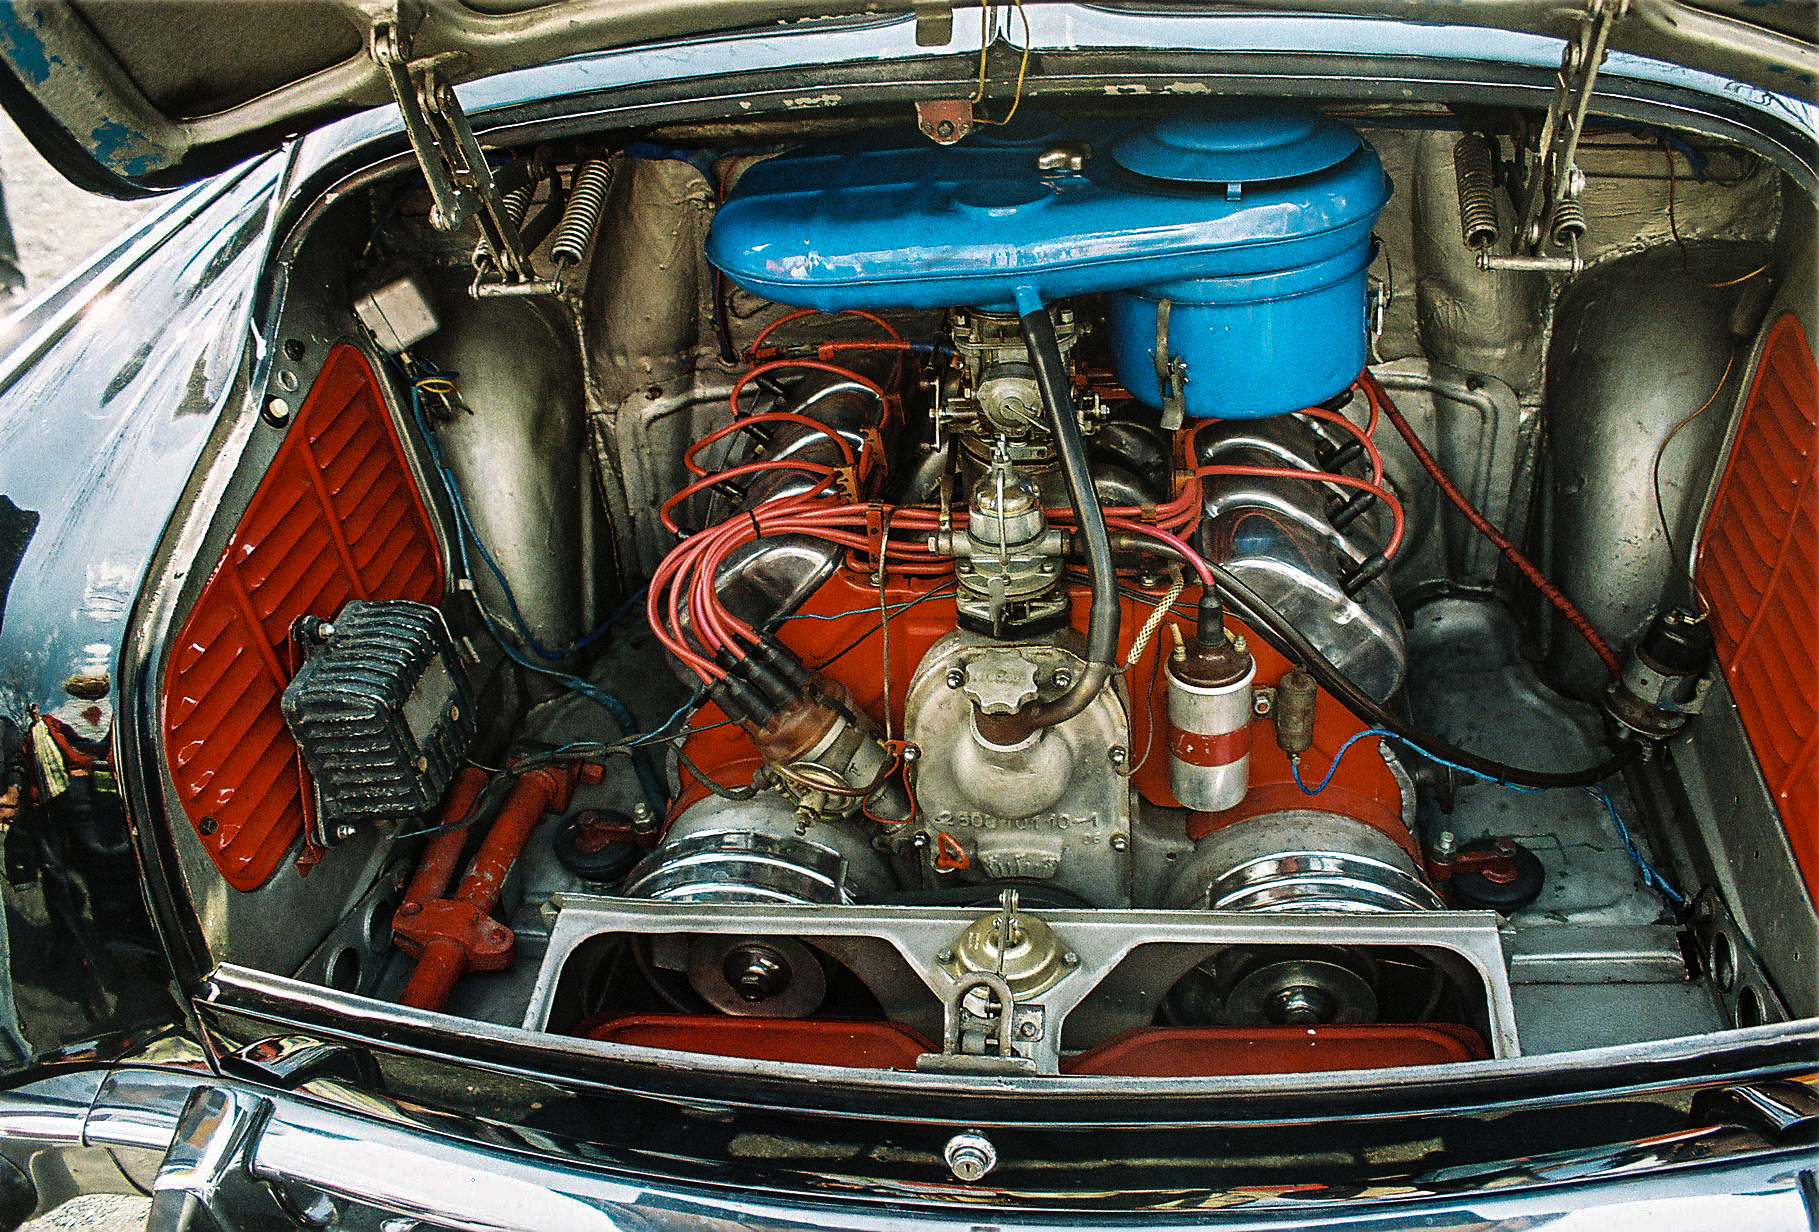 The Cars - AIR DATE 2-9-10 1980